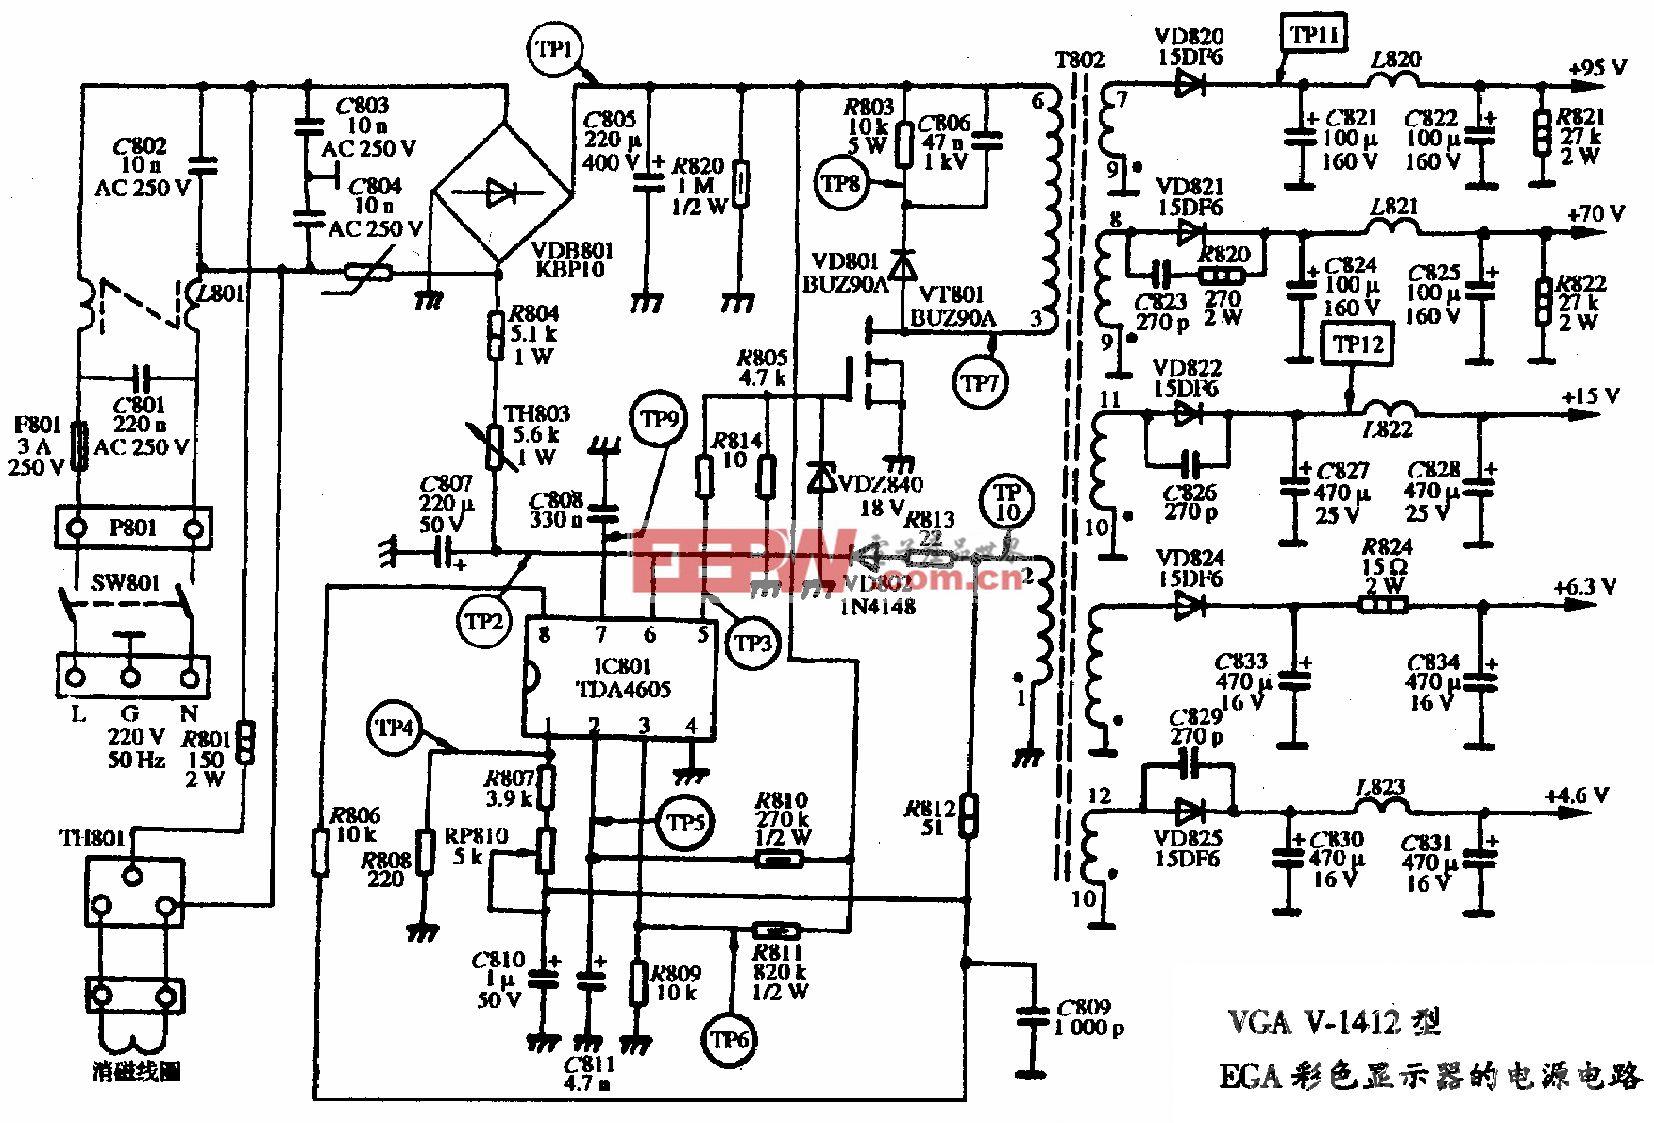 VGA V-1412型EGA彩色顯示器的電源電路图